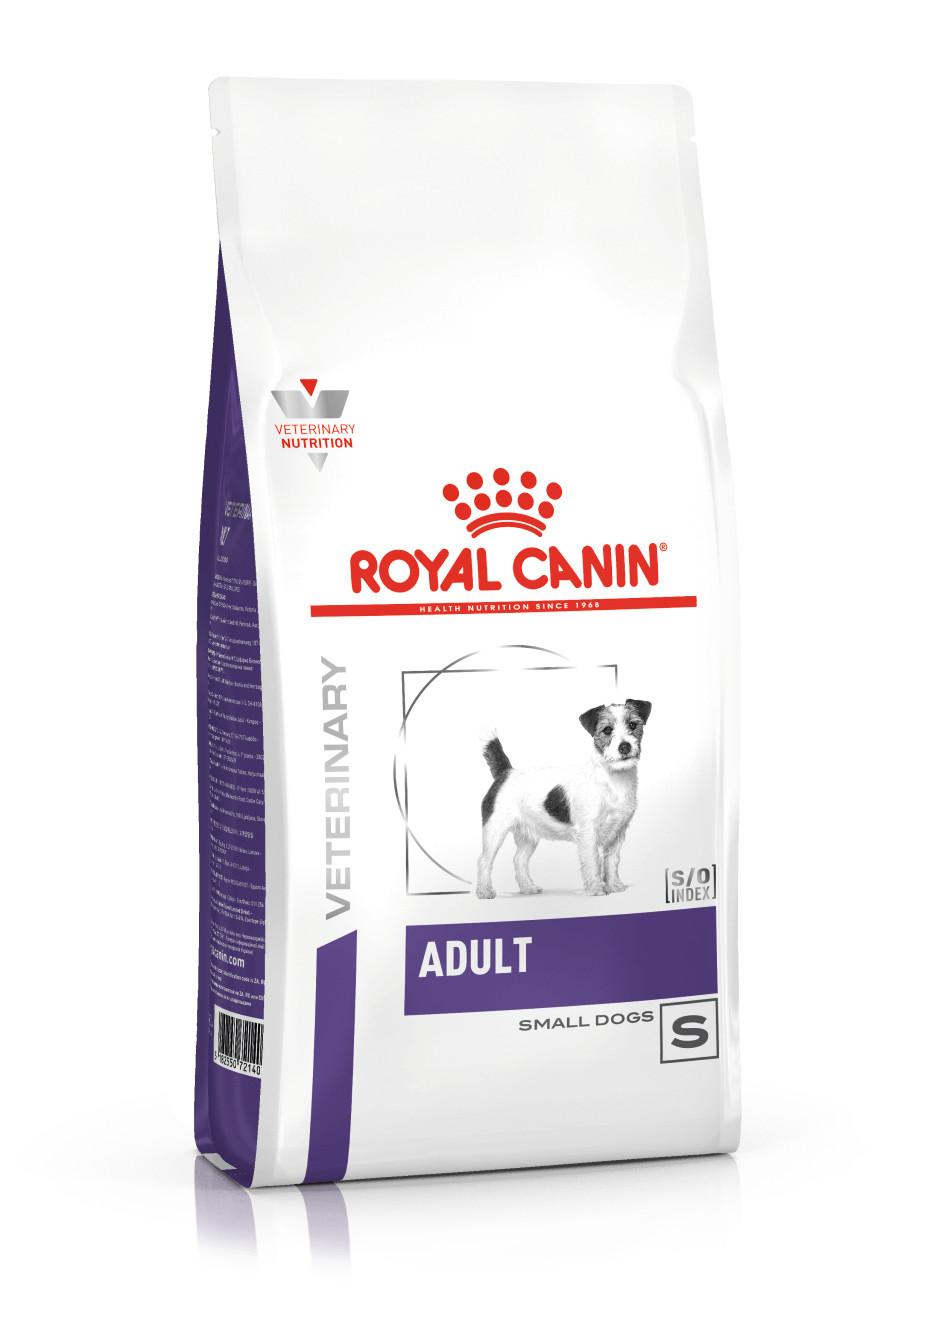 Royal Canin Veterinary Adult Small Dogs hondenvoer